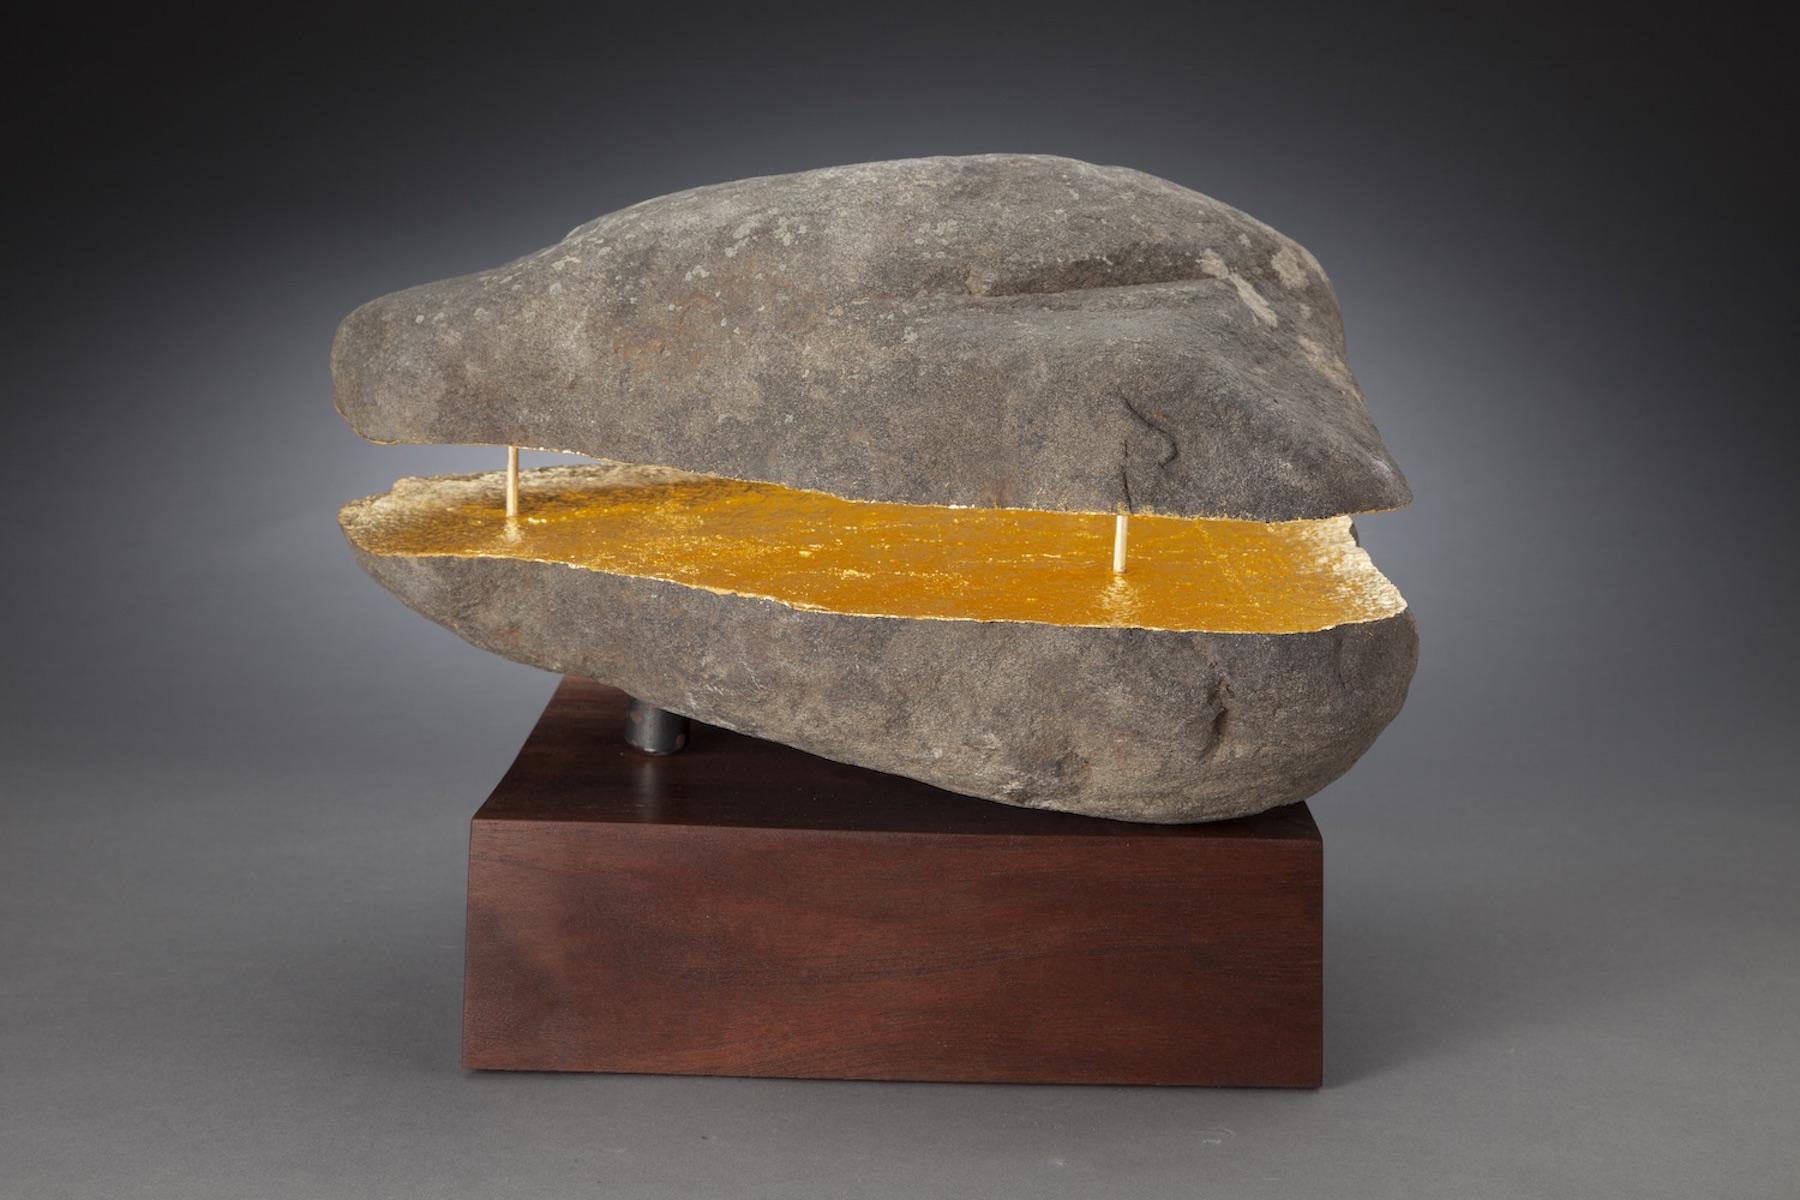 horizontal split rock-H 10in. W 12in D 10in. including base. sandstone, brass, steel, 24k gold leaf, walnut..jpg